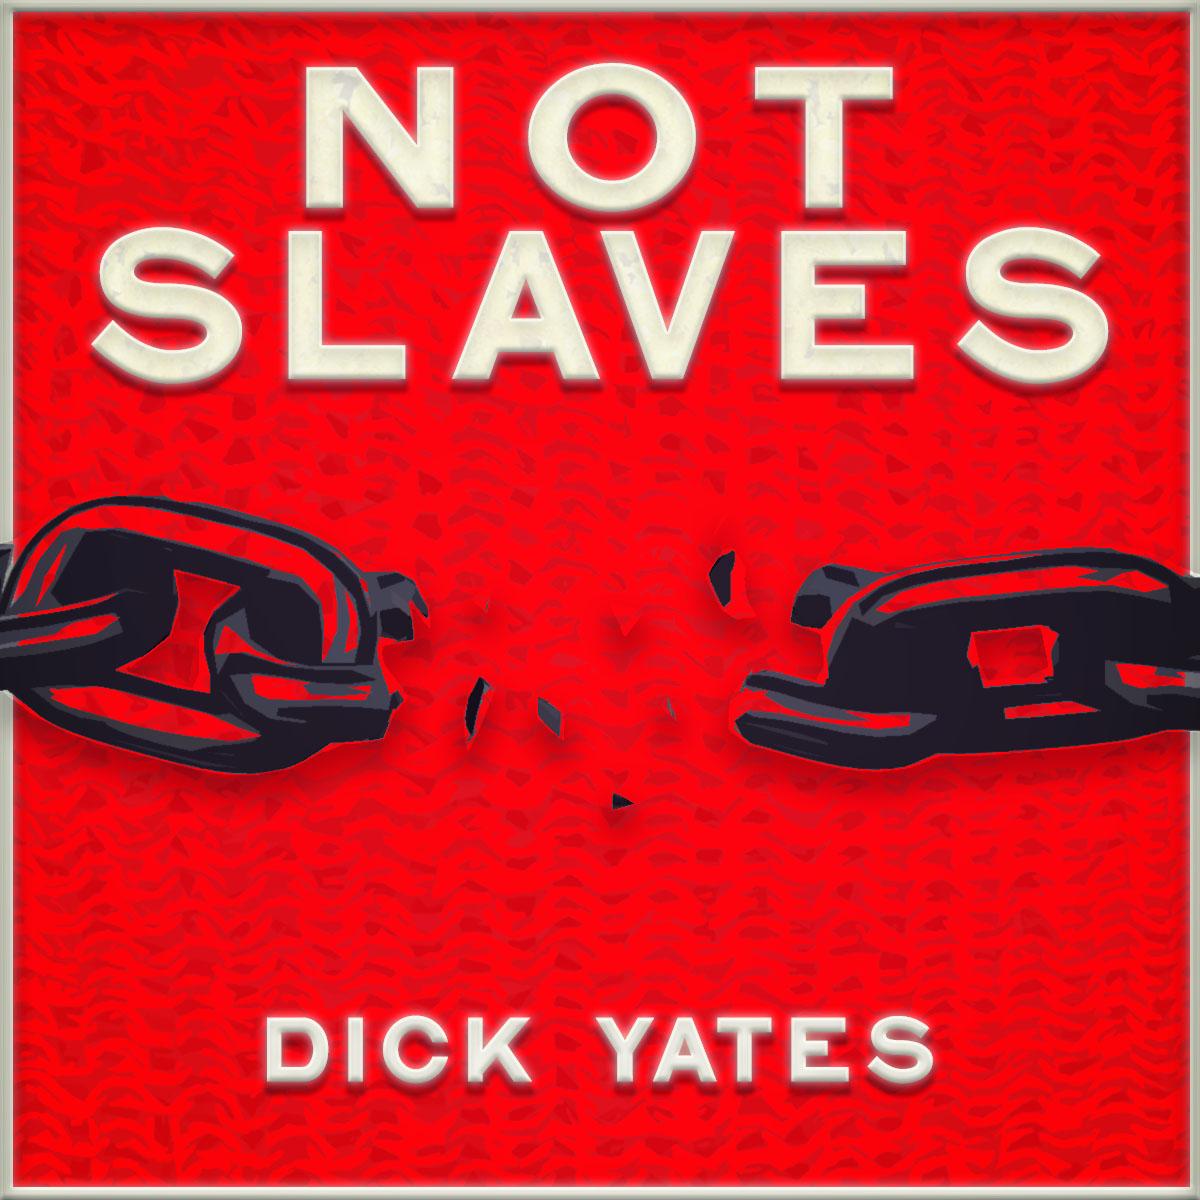 Not Slaves_Dick Yates_Cover Art